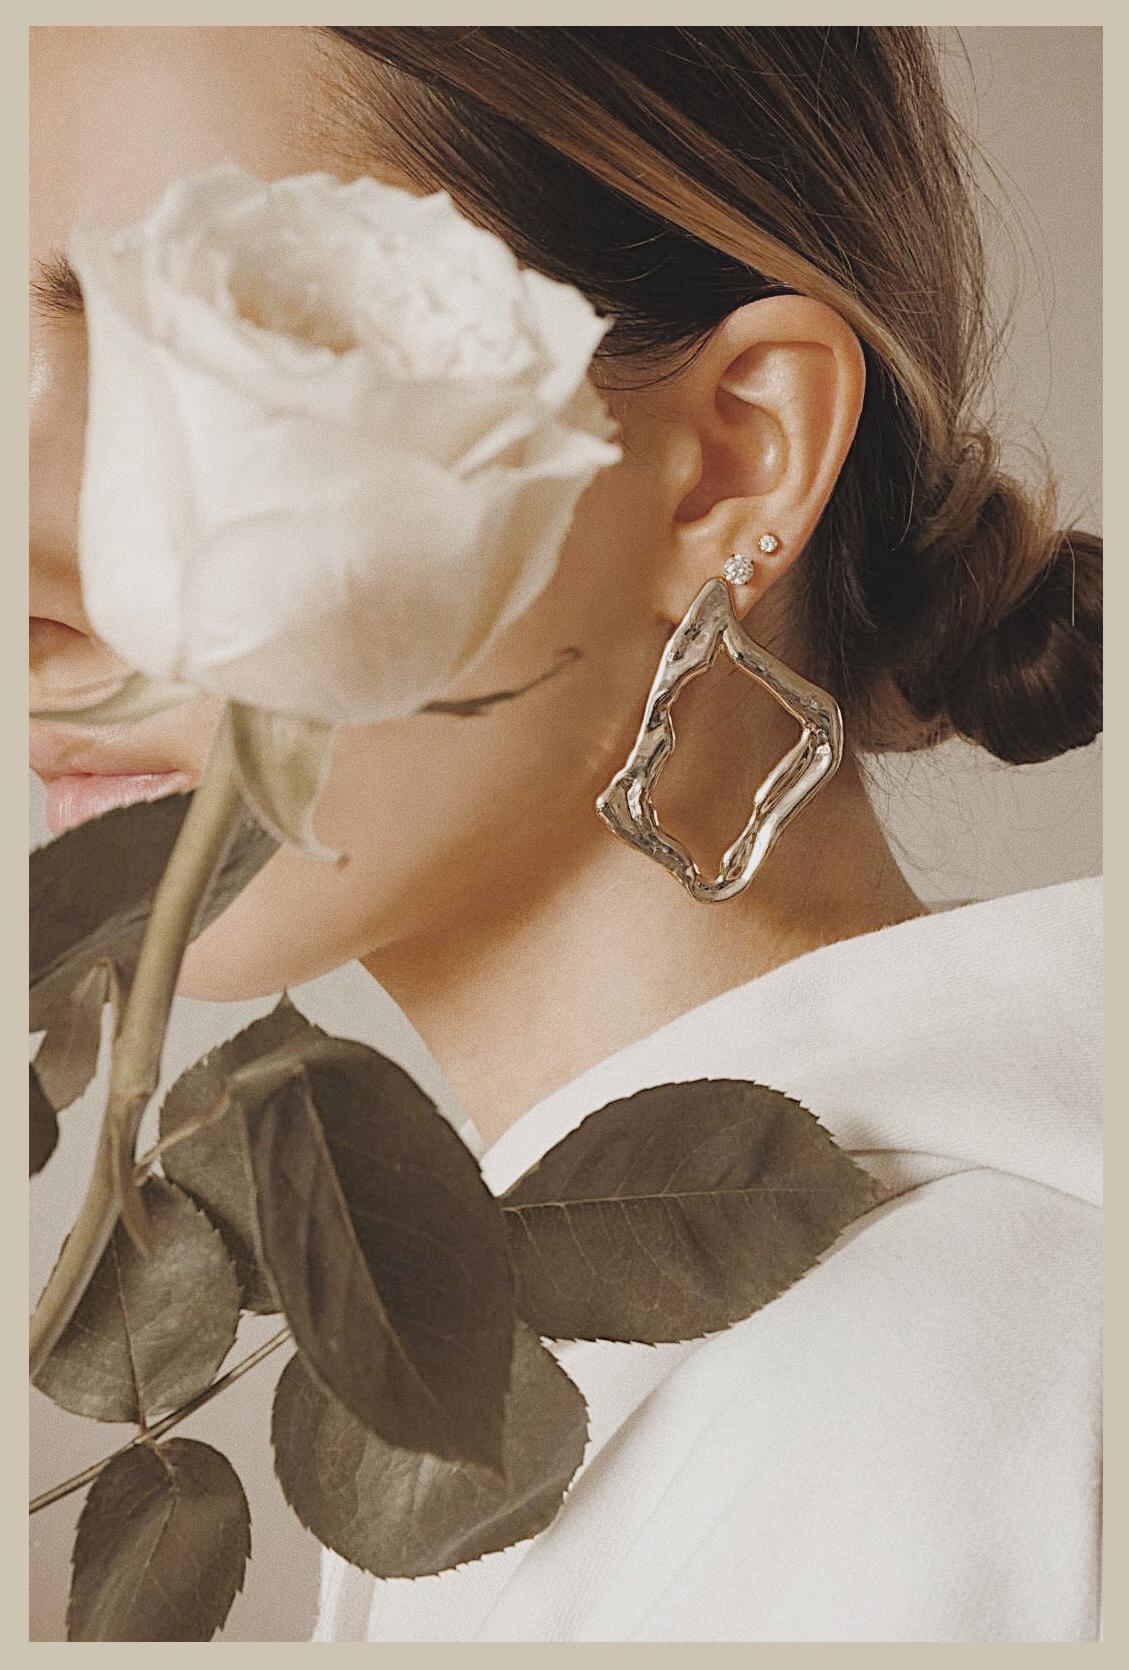 ana_luisa_earrings_roses_photoshoor_jewelry_jewels_the_white_ocean_lena_juice_08